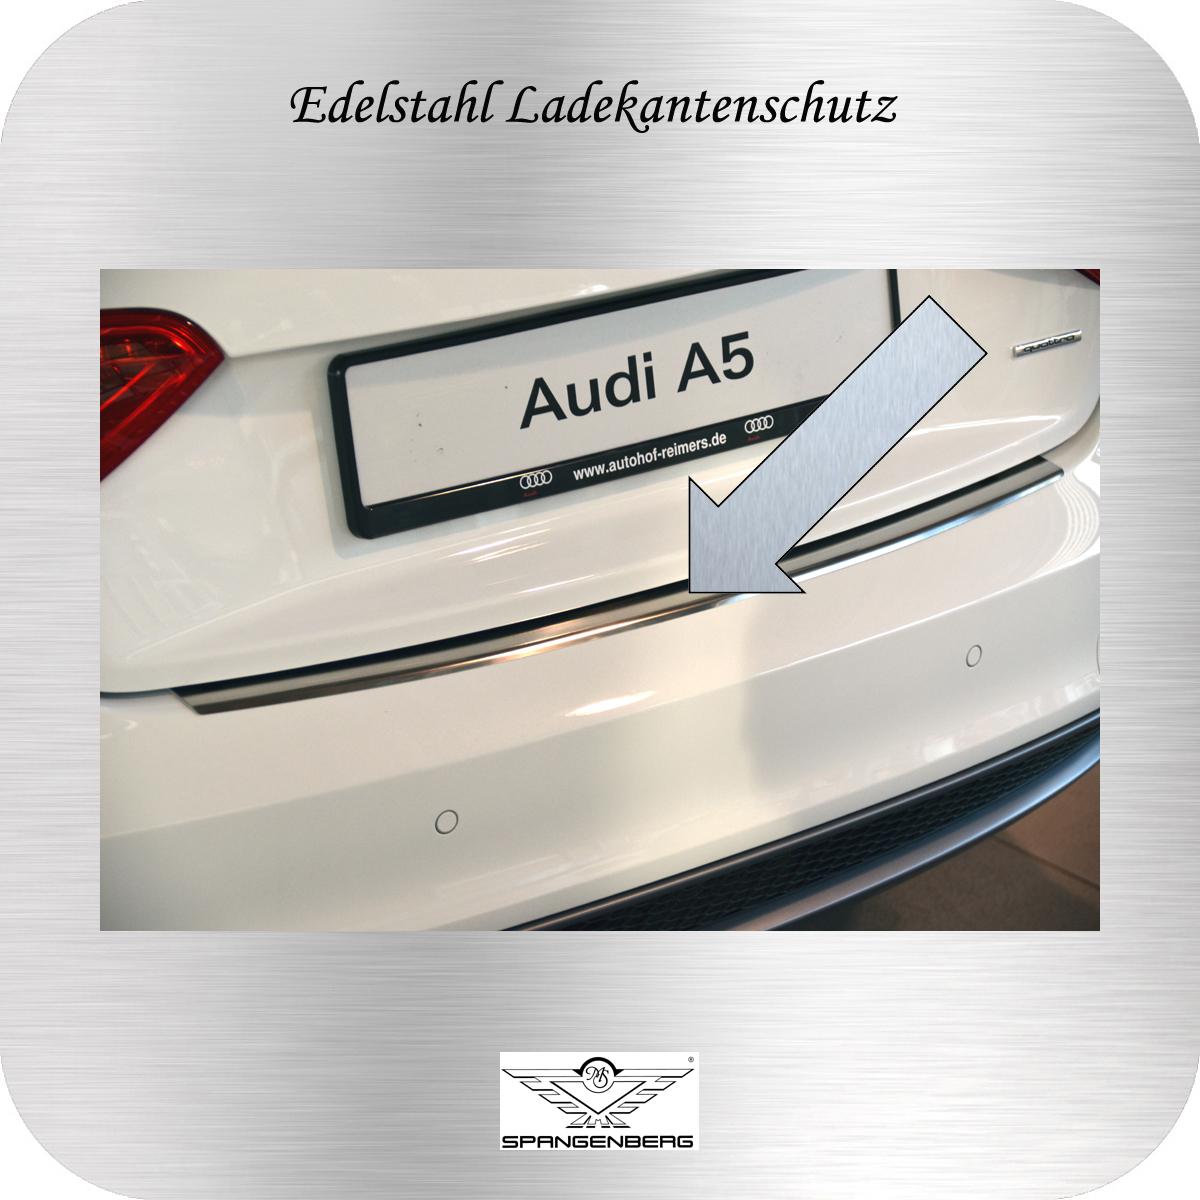 Ladekantenschutz Edelstahl Audi A5 Sportback 8TA Bj 2009-2018 3235508